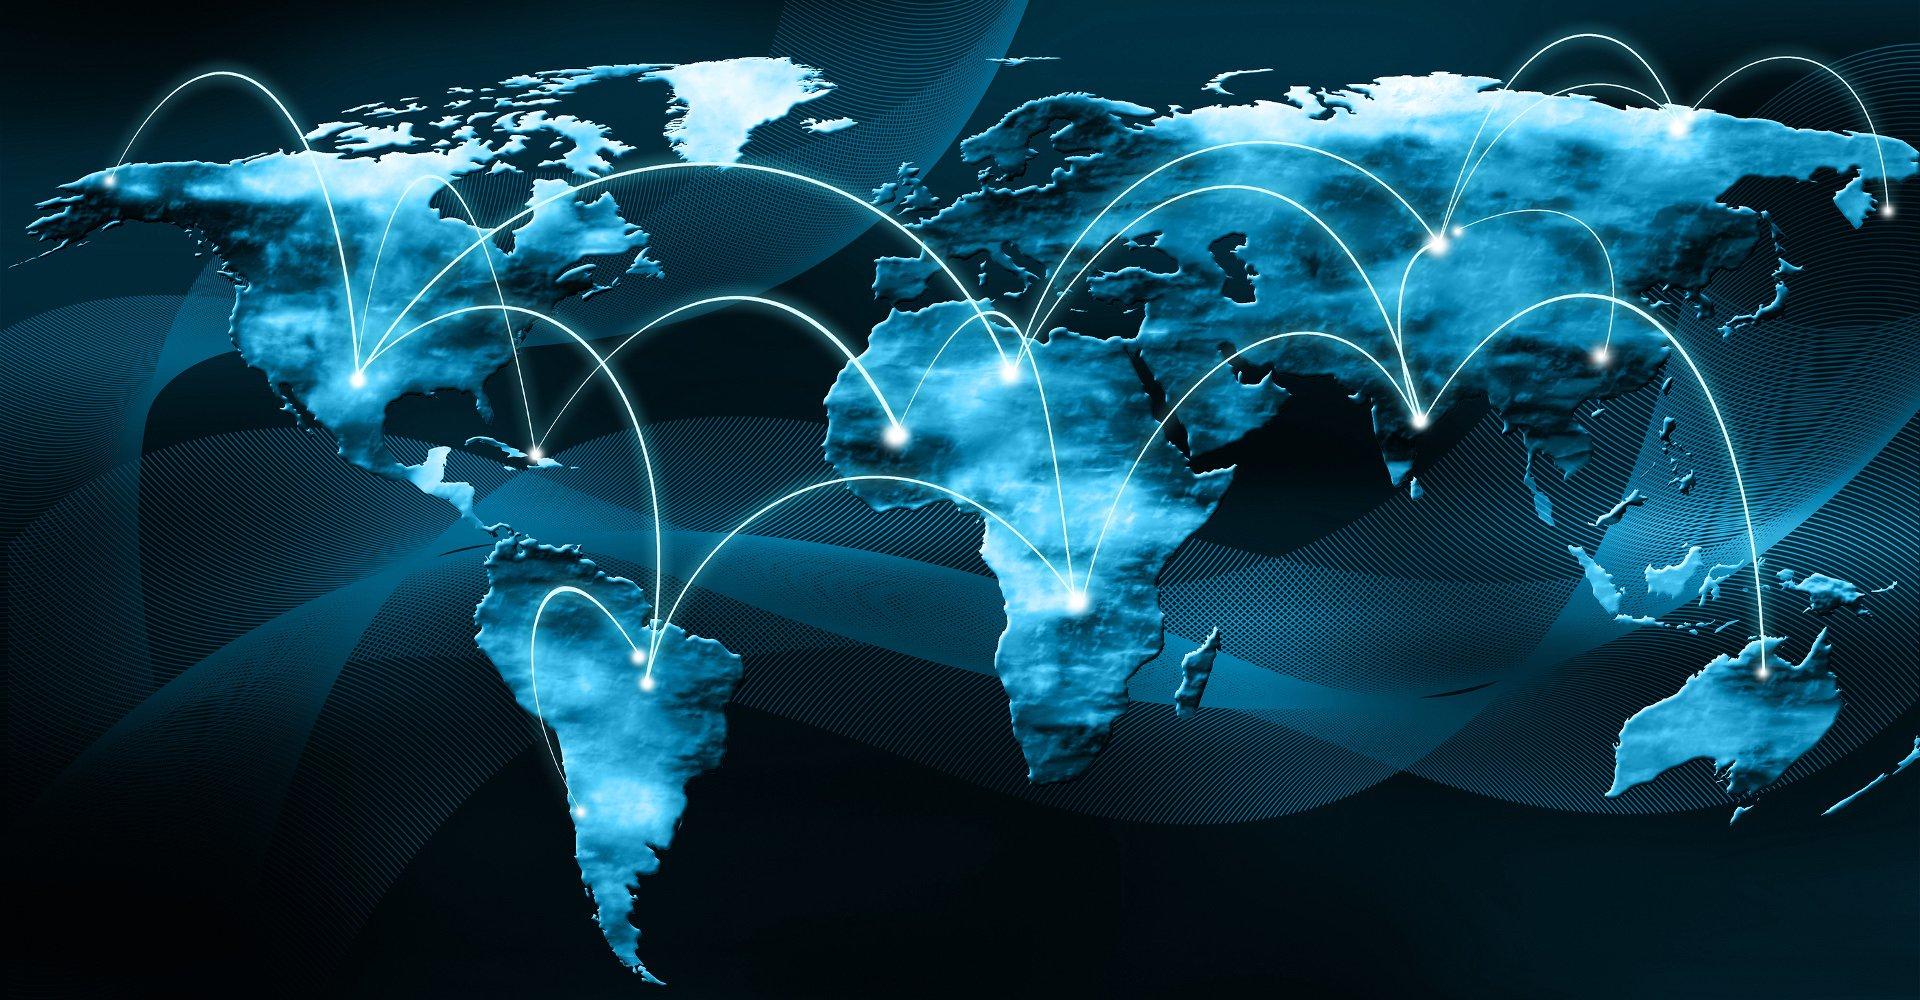 international communication Avixa is the trade association representing the professional audiovisual and information communications industries worldwide.